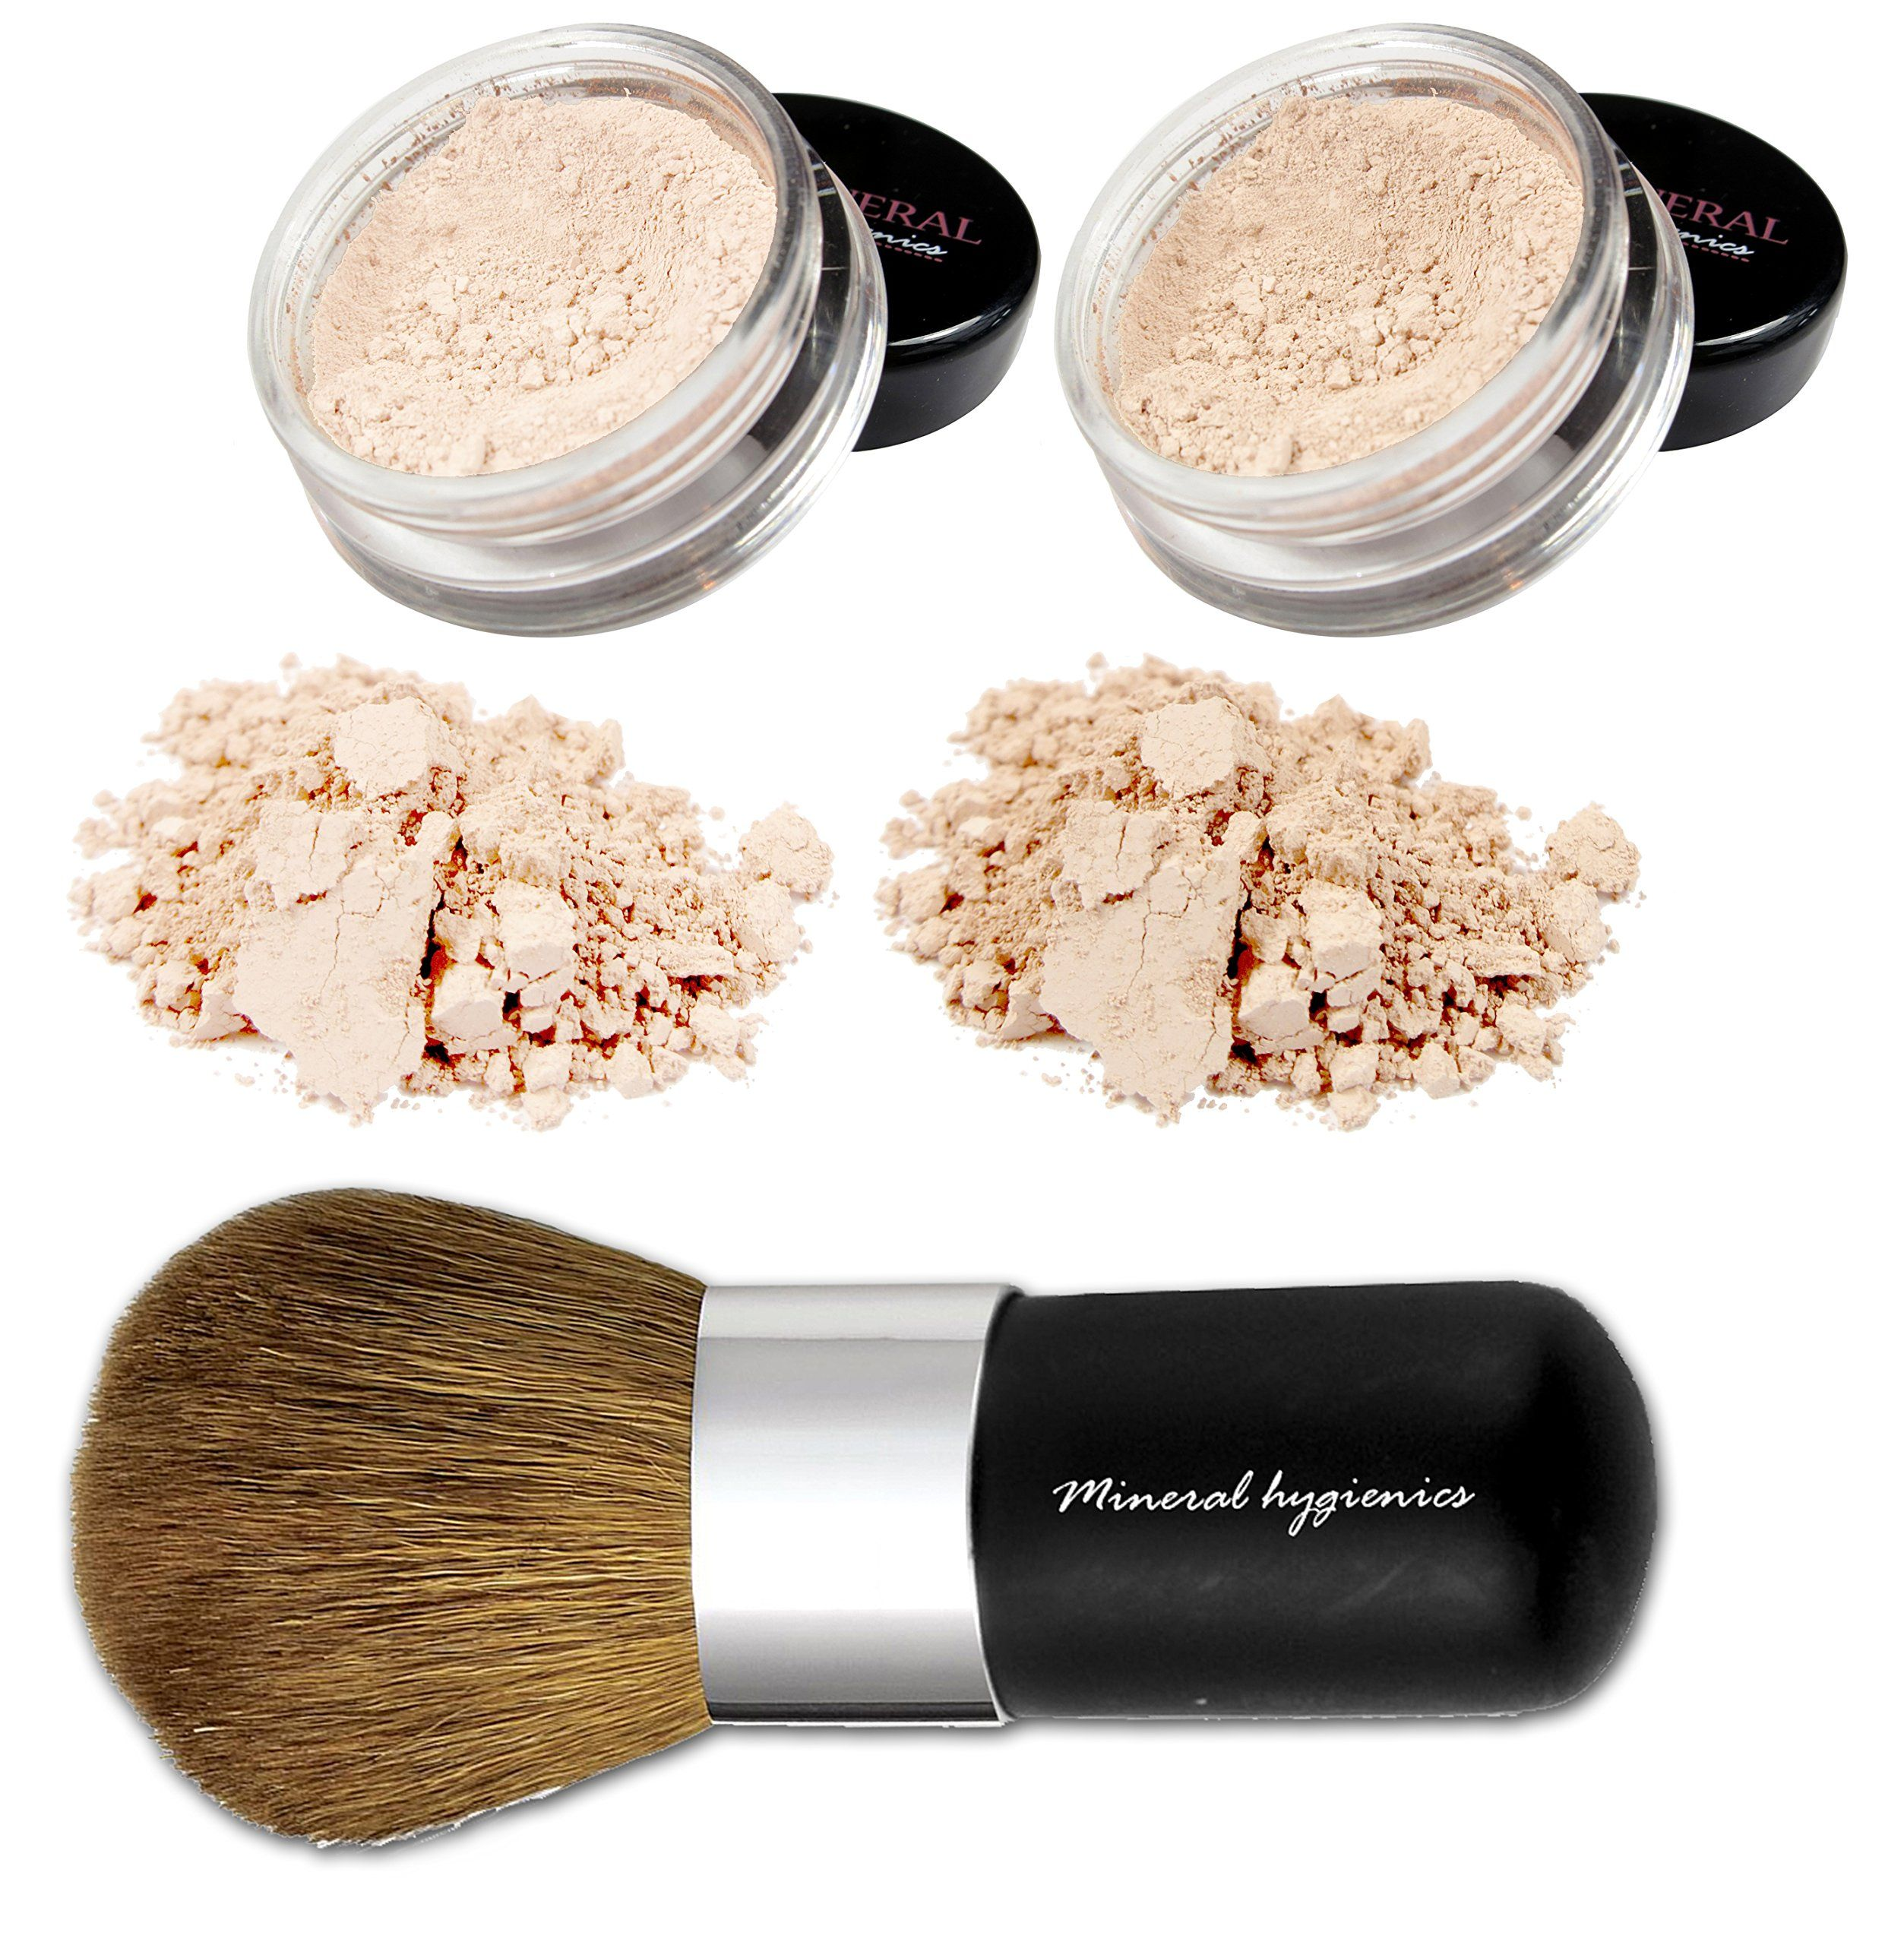 Mineral Makeup Starter Kit Light Mini. Save over 45.00